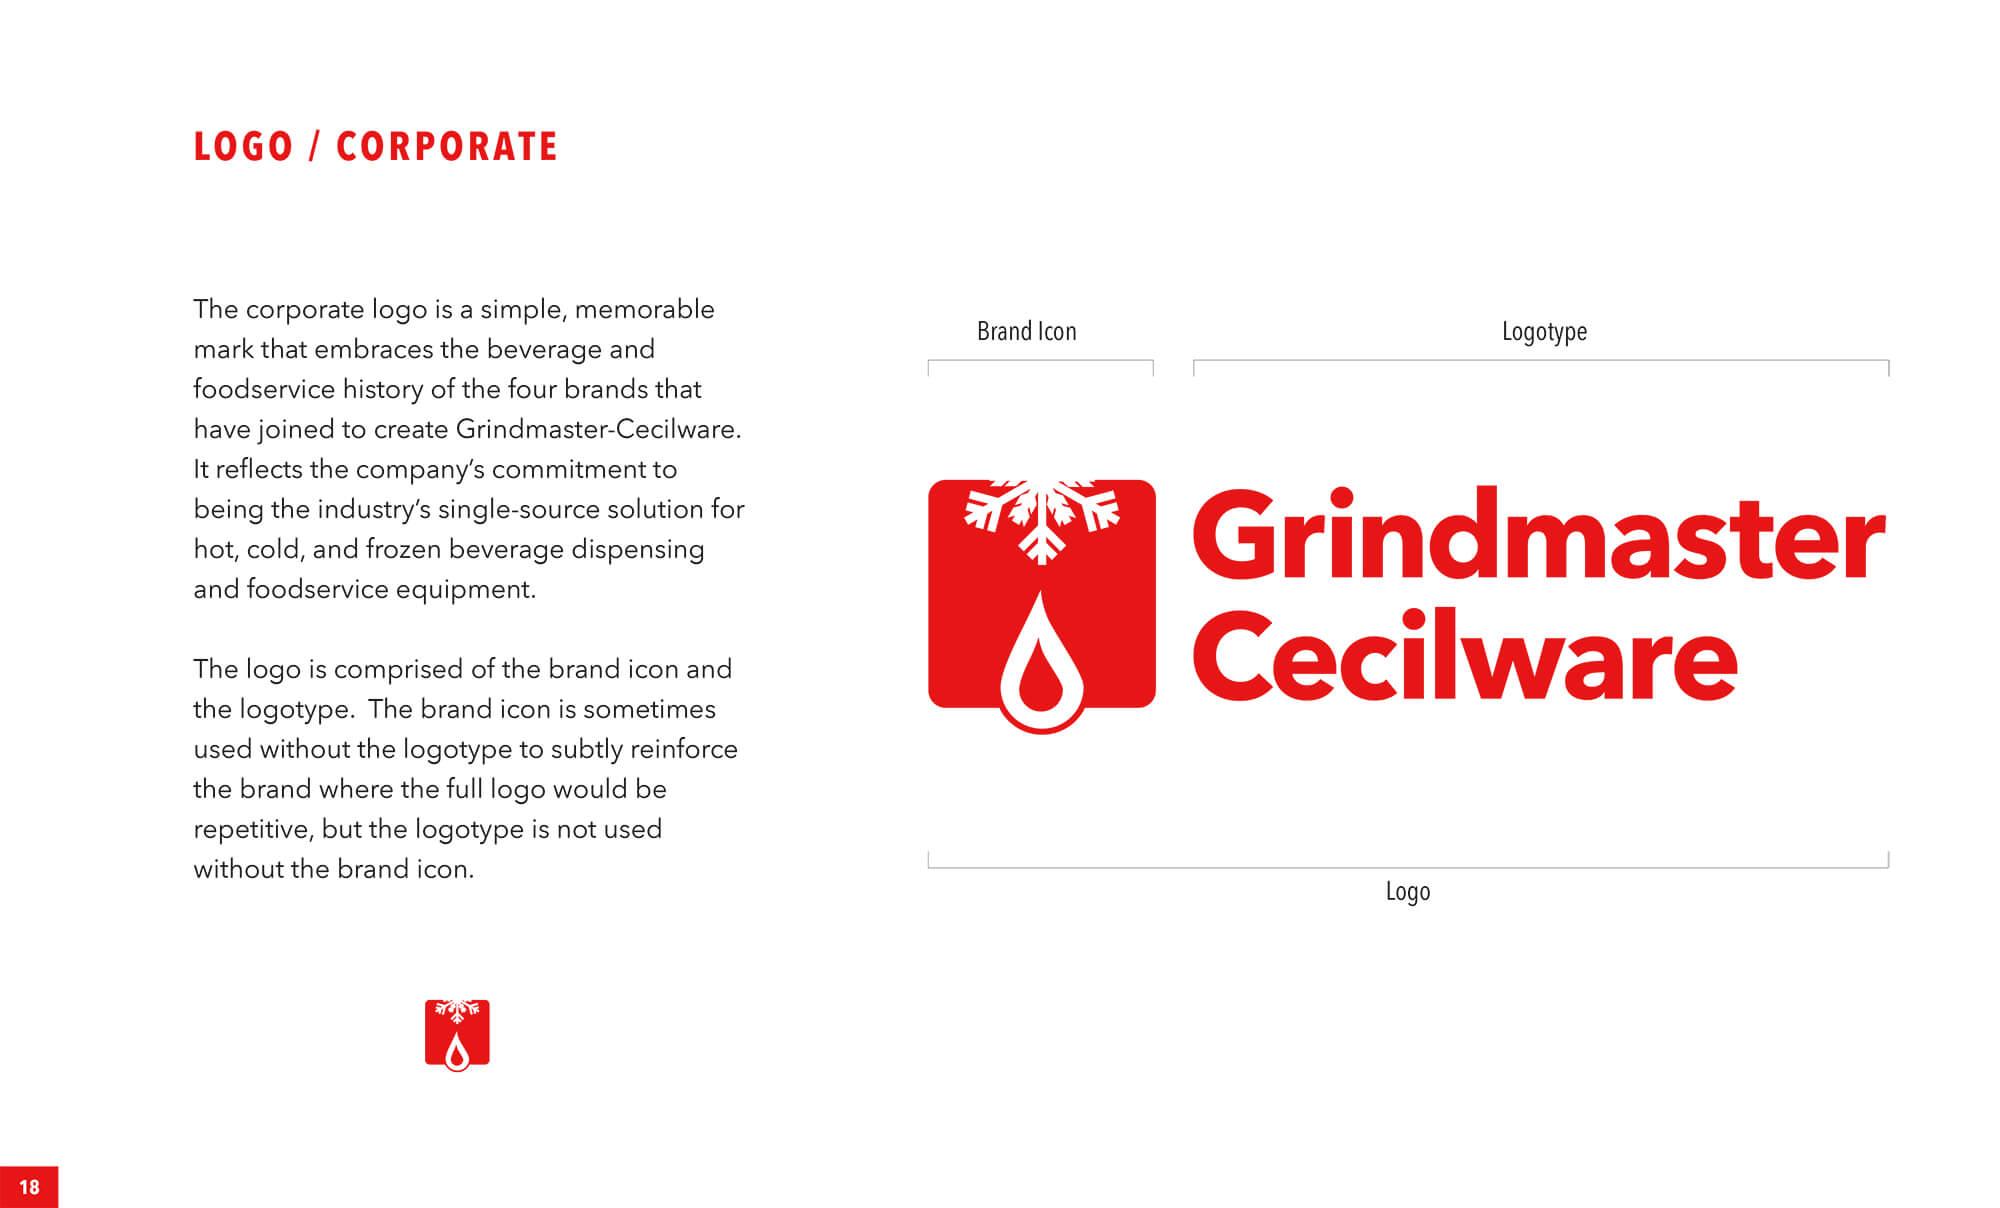 Grindmaster-Cecilware Brand Standards